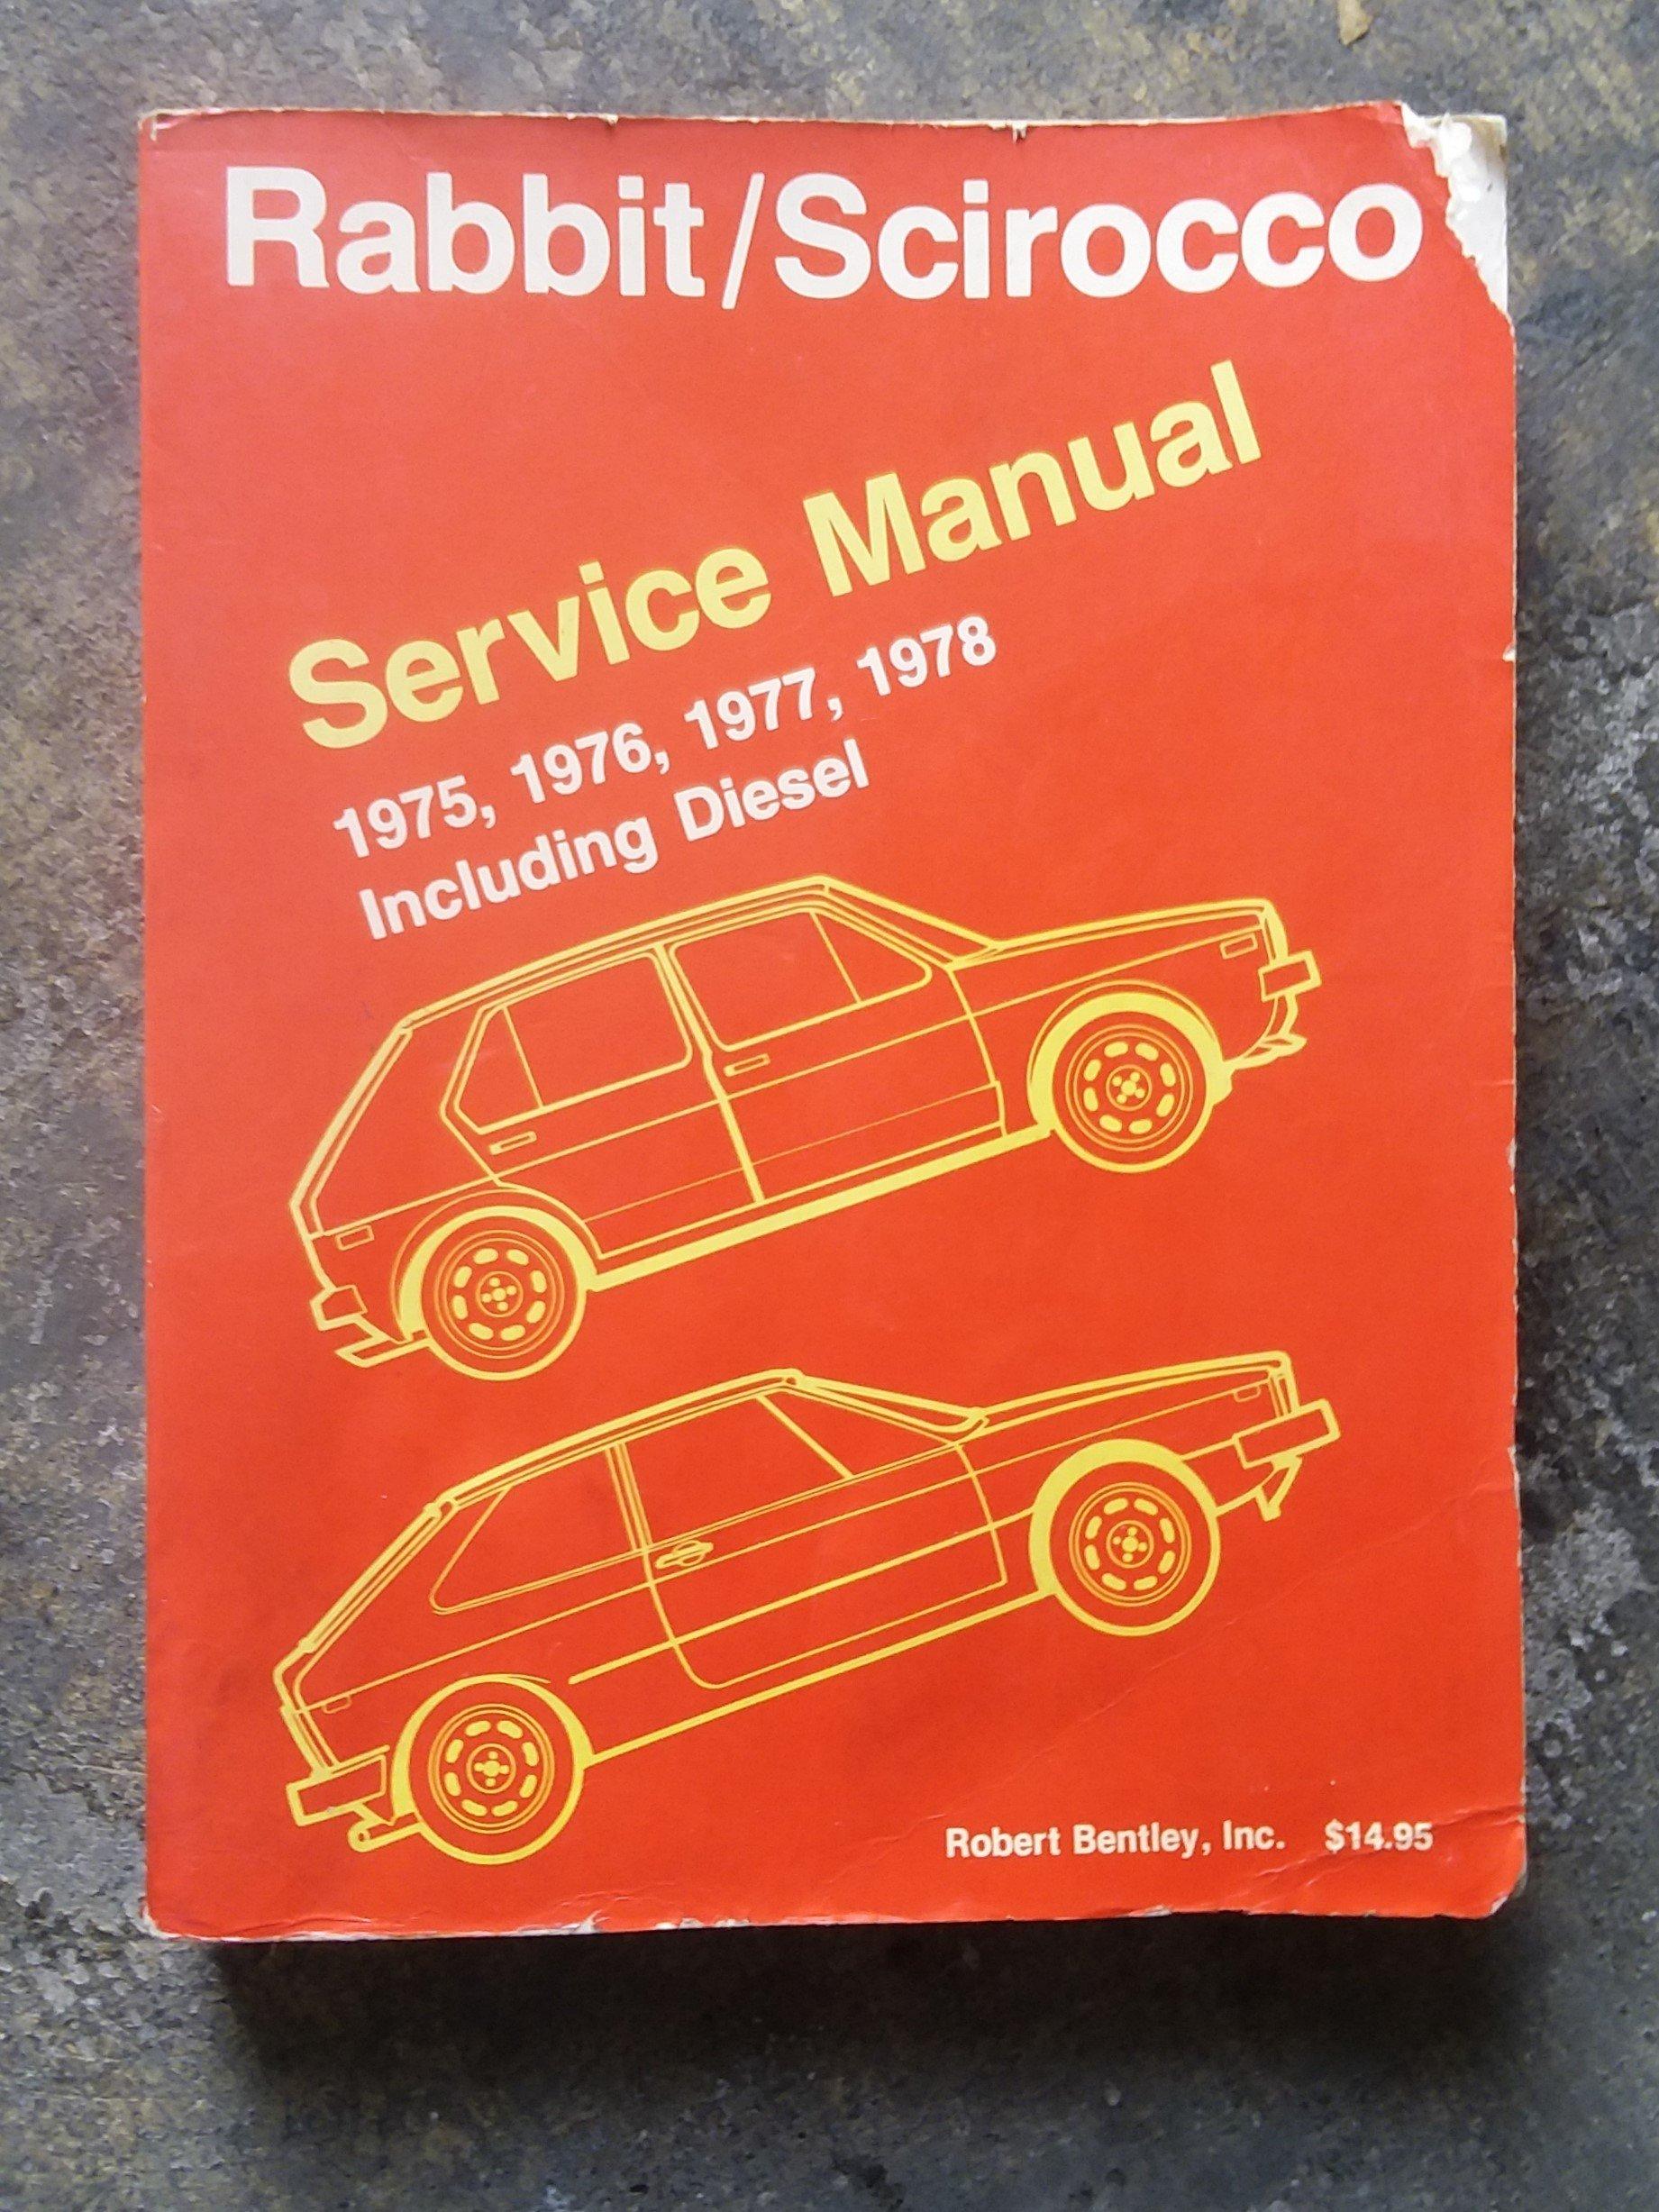 Volkswagen Rabbit, Scirocco service manual, 1975, 1976, 1977, 1978: Bentley  Publishers: 9780837600895: Amazon.com: Books